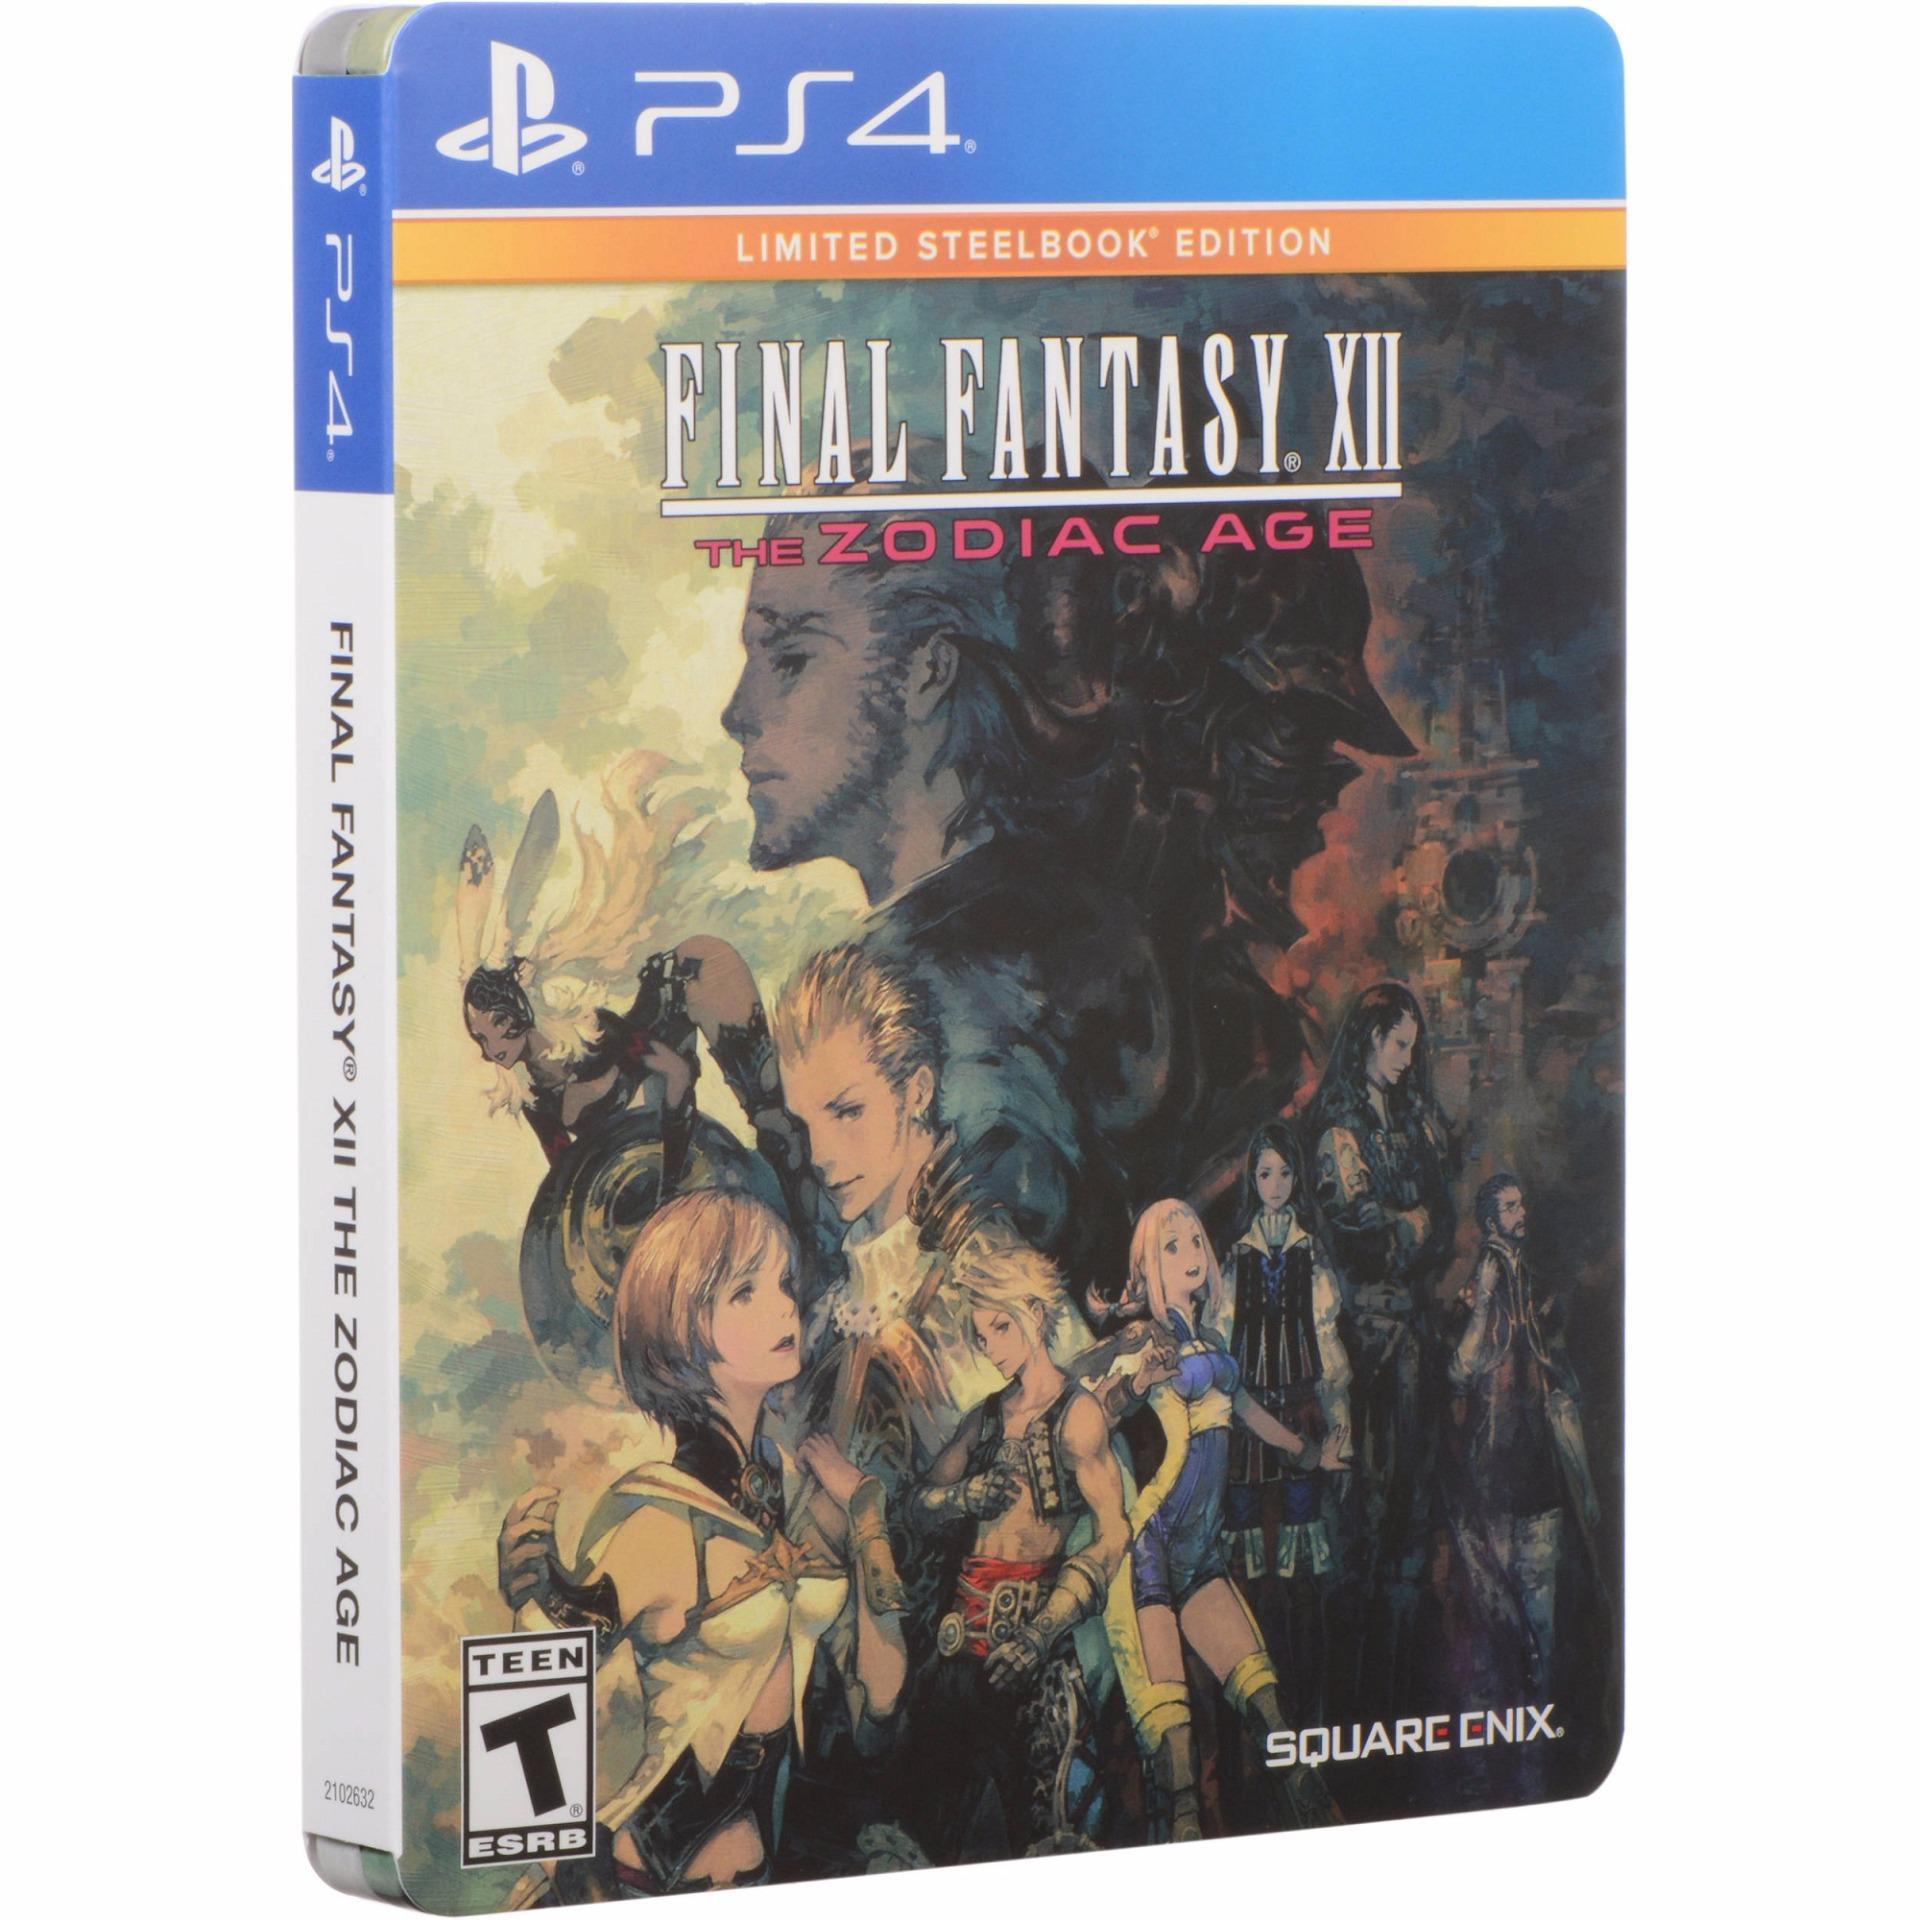 Đĩa Game Ps4 Final Fantasy Xii: The Zodiac Age Steelbook